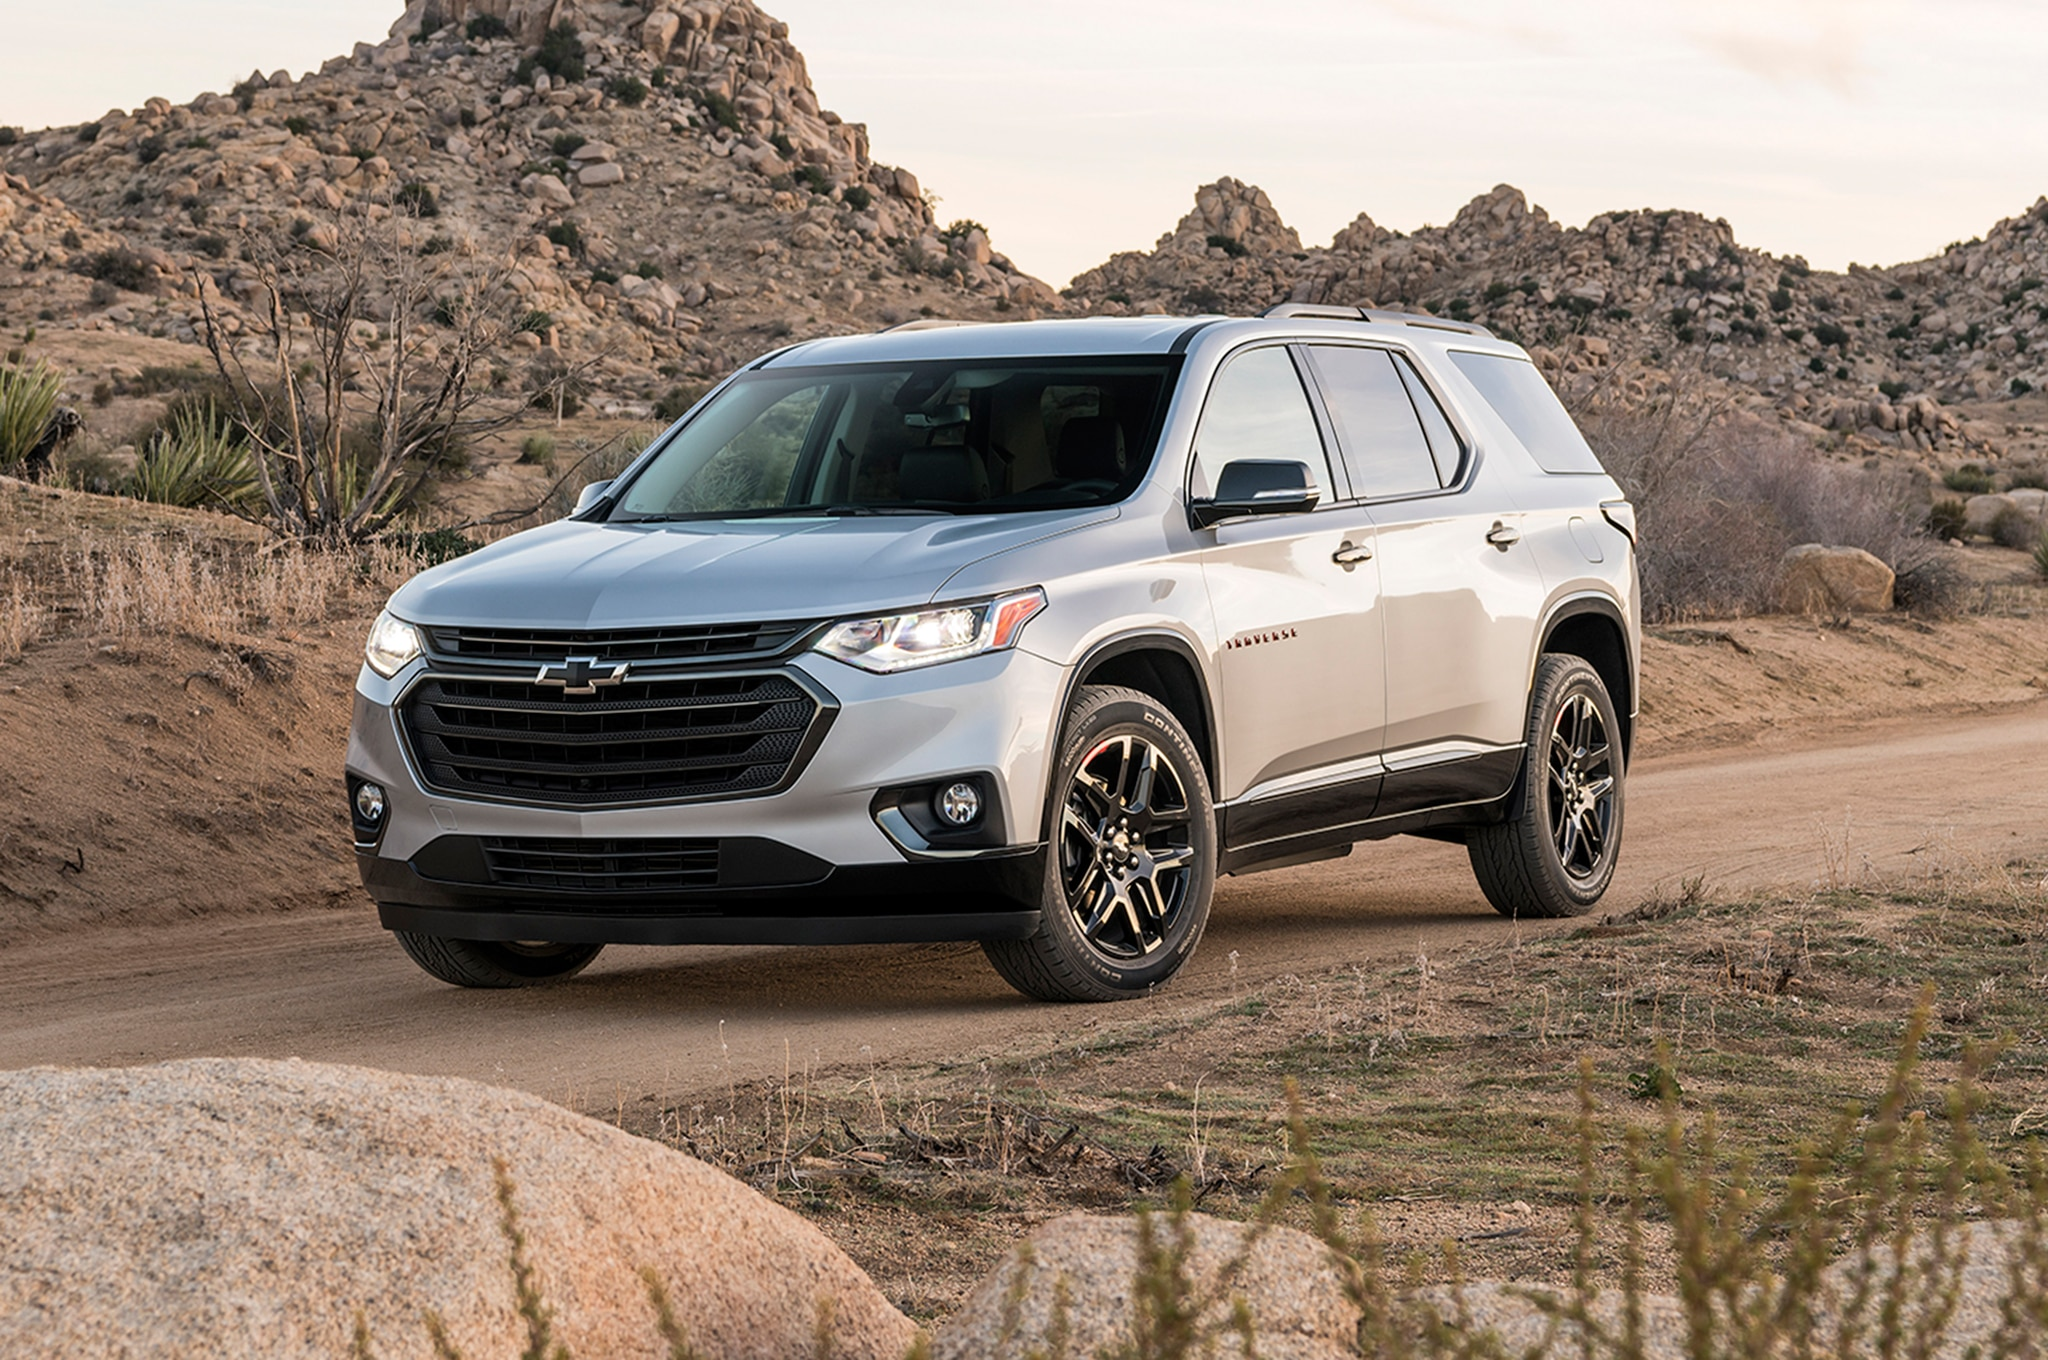 2018 Chevy Traverse Redline >> 2018 Chevrolet Traverse FWD Premier Quick Take Review